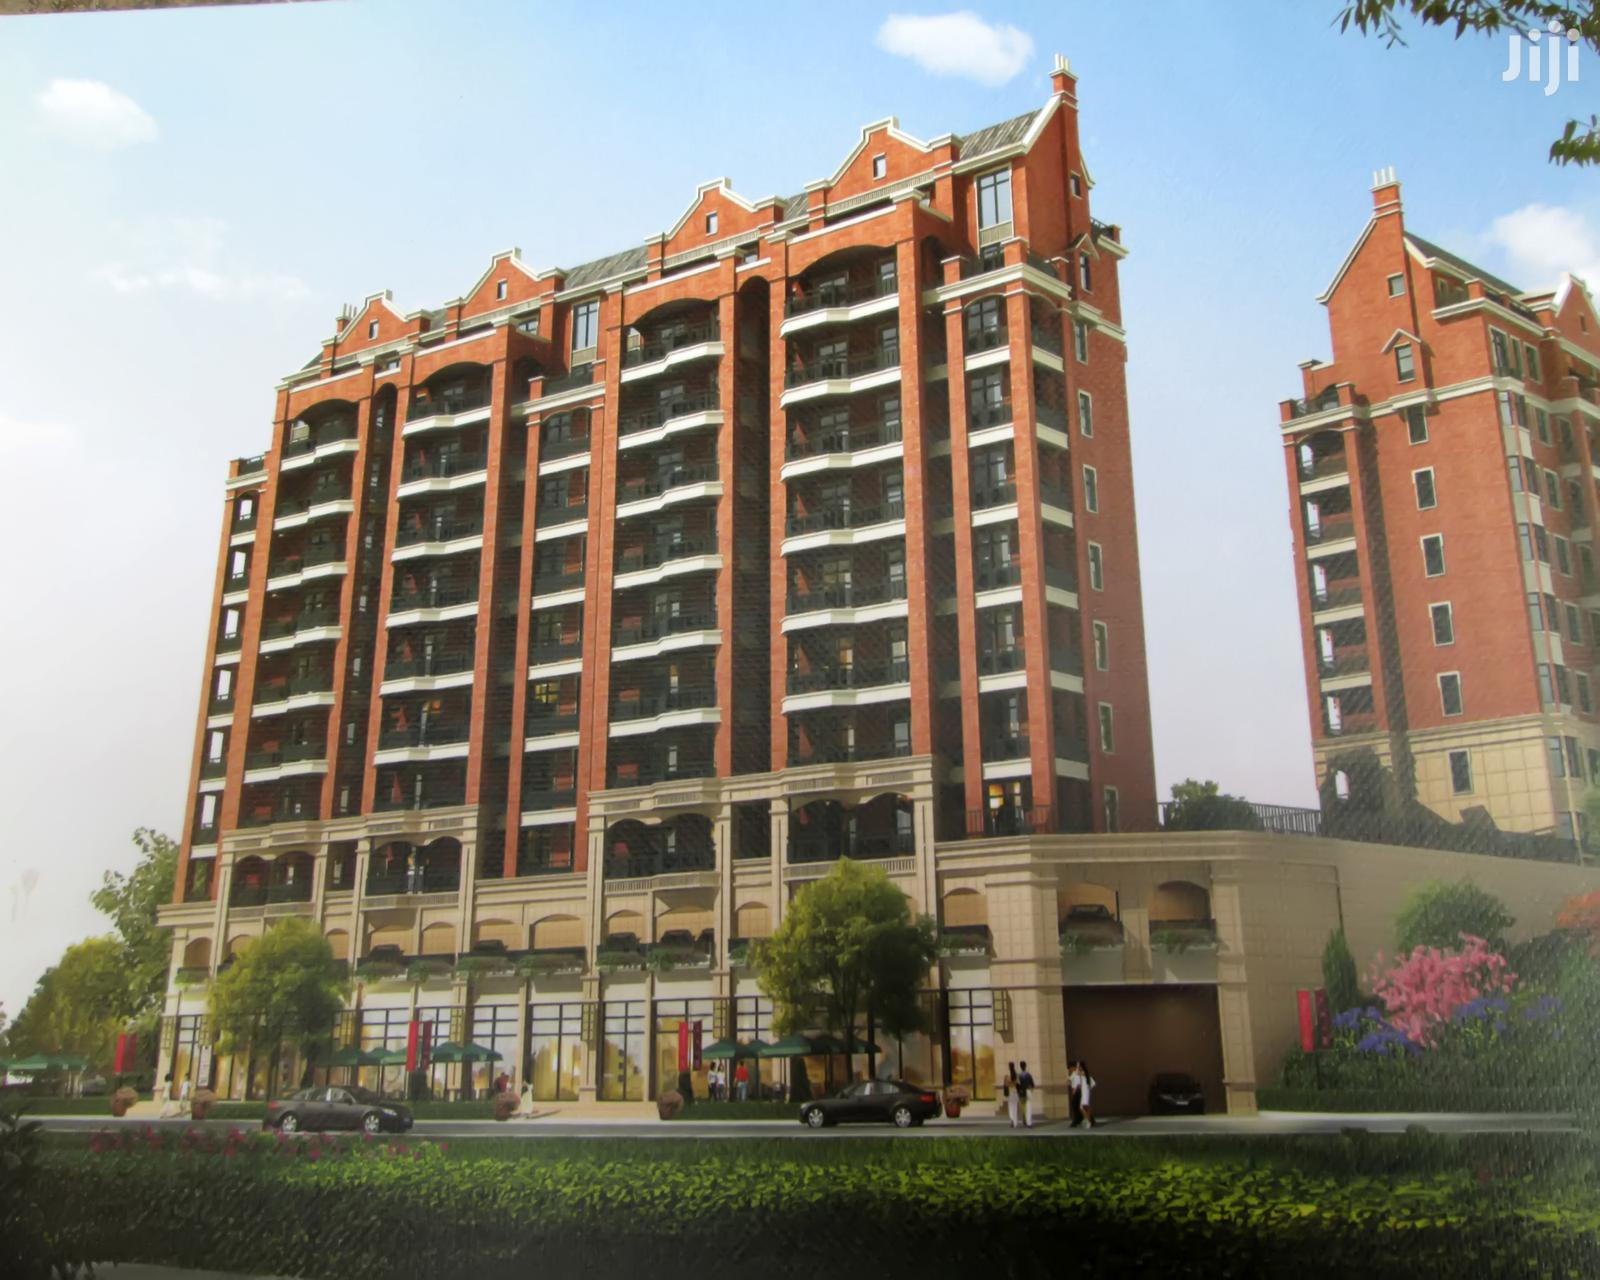 Condominium Apartments Of Penthouse On Sale In Upper Naguru, Bukoto | Houses & Apartments For Sale for sale in Kampala, Central Region, Uganda